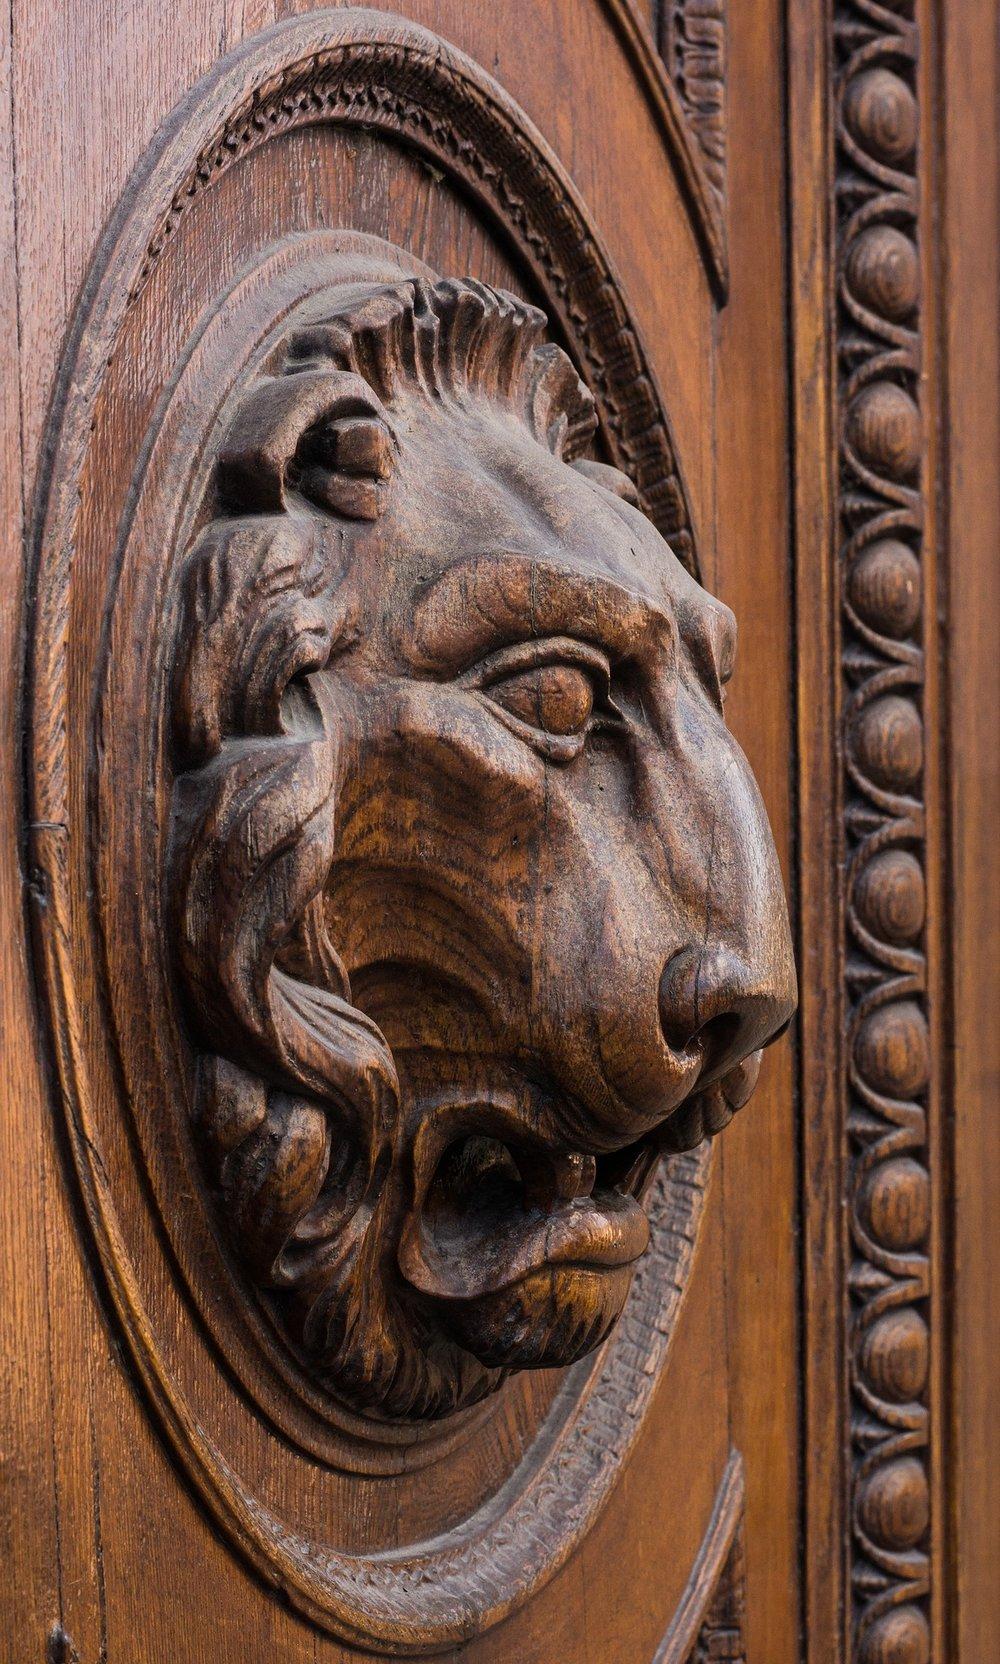 lion-2136928_1920.jpg